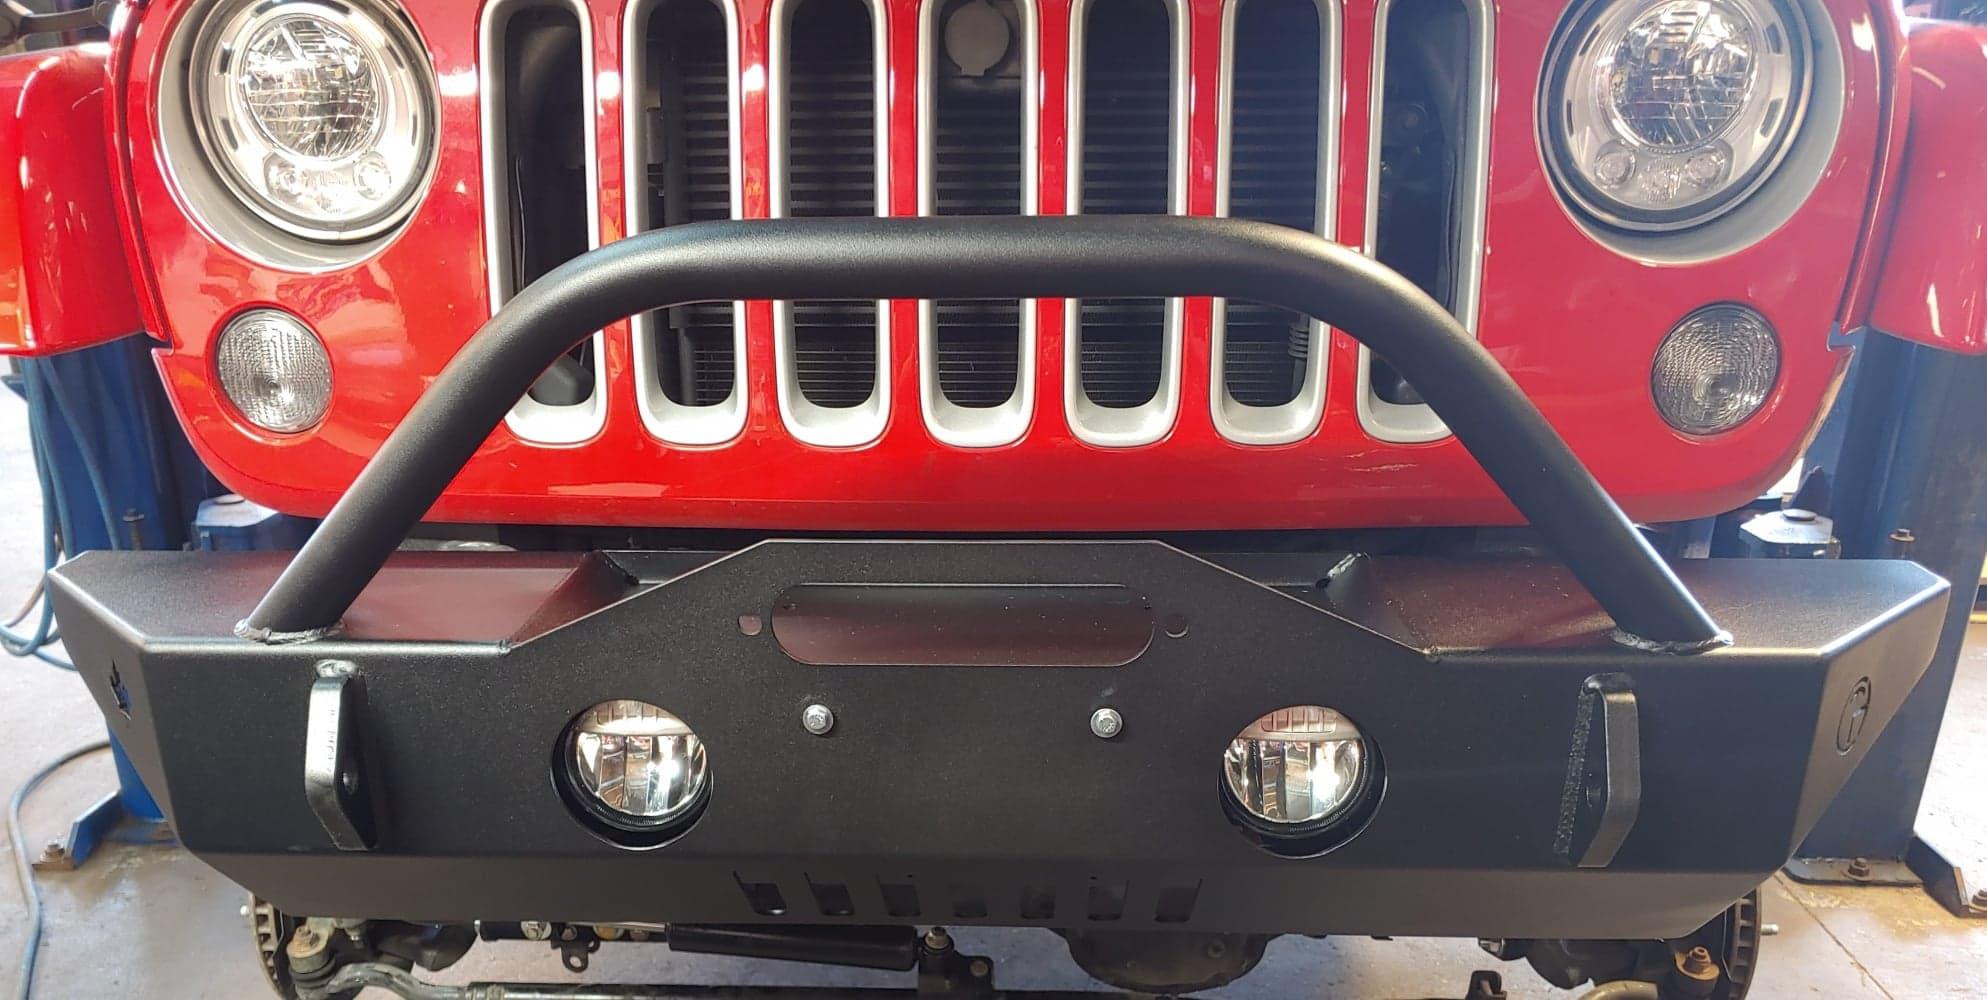 Trail Head Customs Front Mid-Width Bumper In Black For 2007-20+ Jeep Wrangler JK/JL & Gladiator JT Models JKFBS-BLK